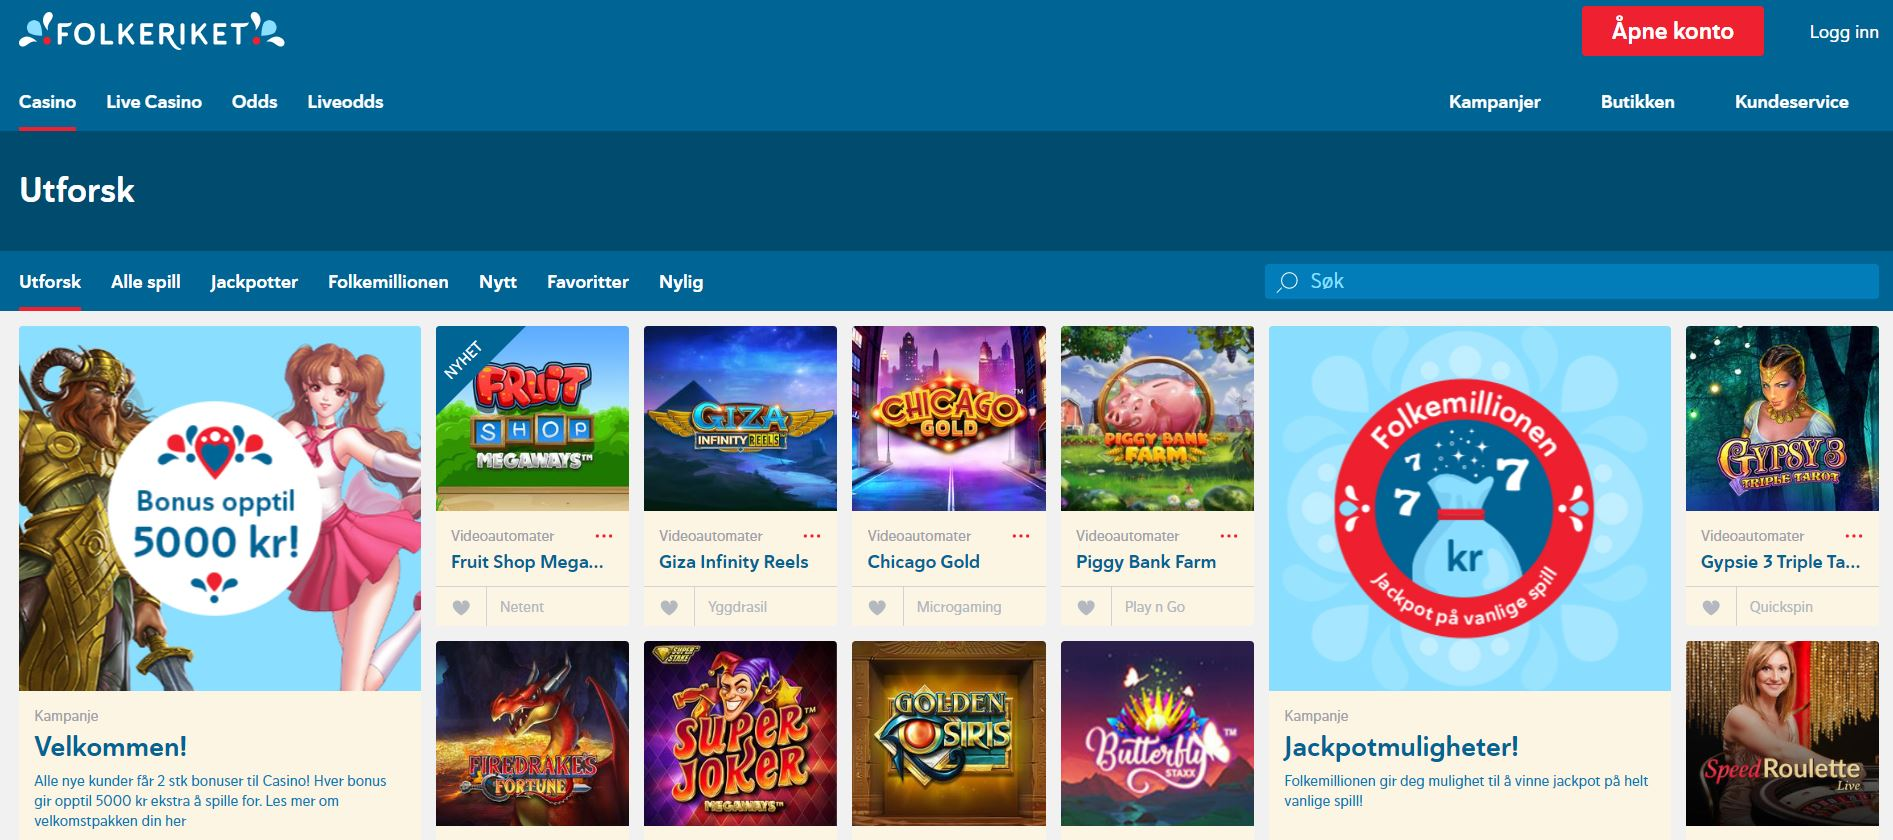 casino lobby folkeriket